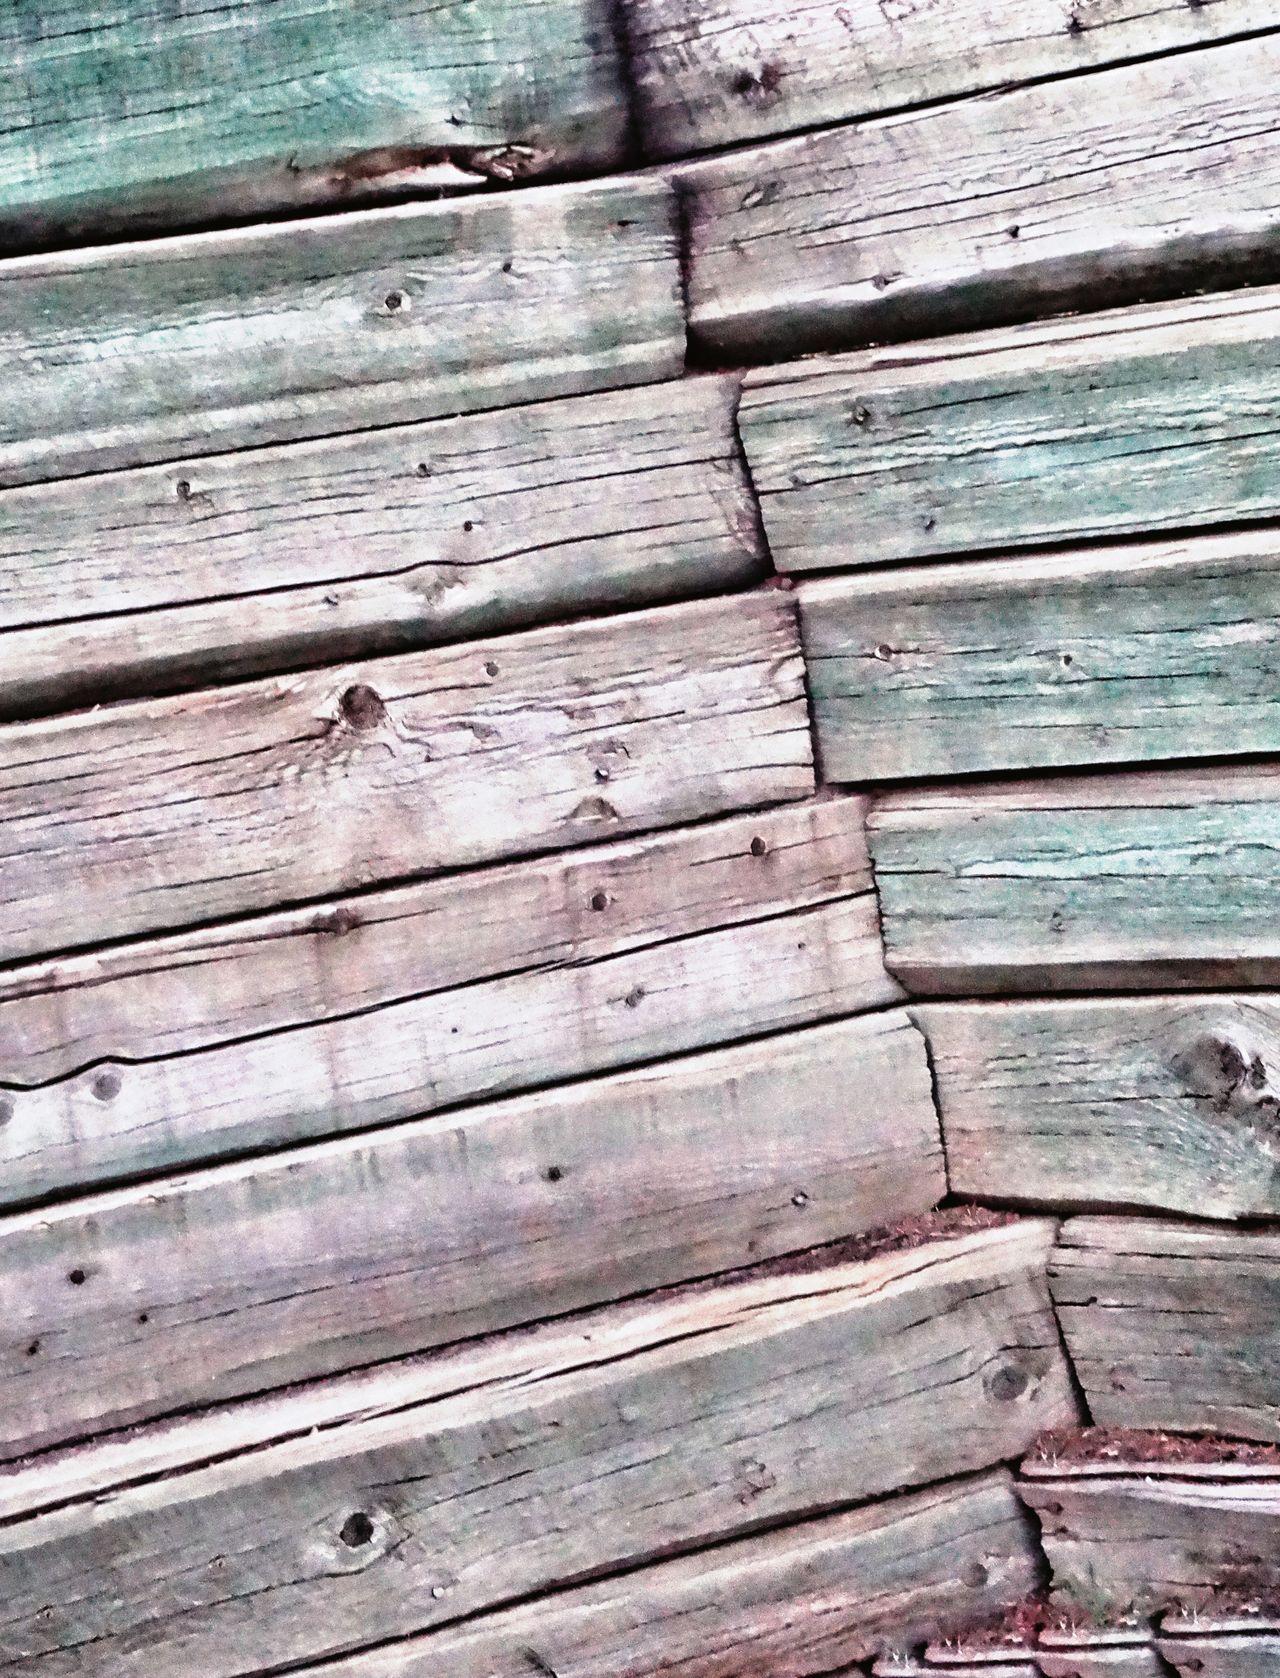 Showcase March EyeEm Best Edits From Mypointofview EyeEm Best Shots Eyemphotography Wooden Slats Greenish Wooden Slats Background